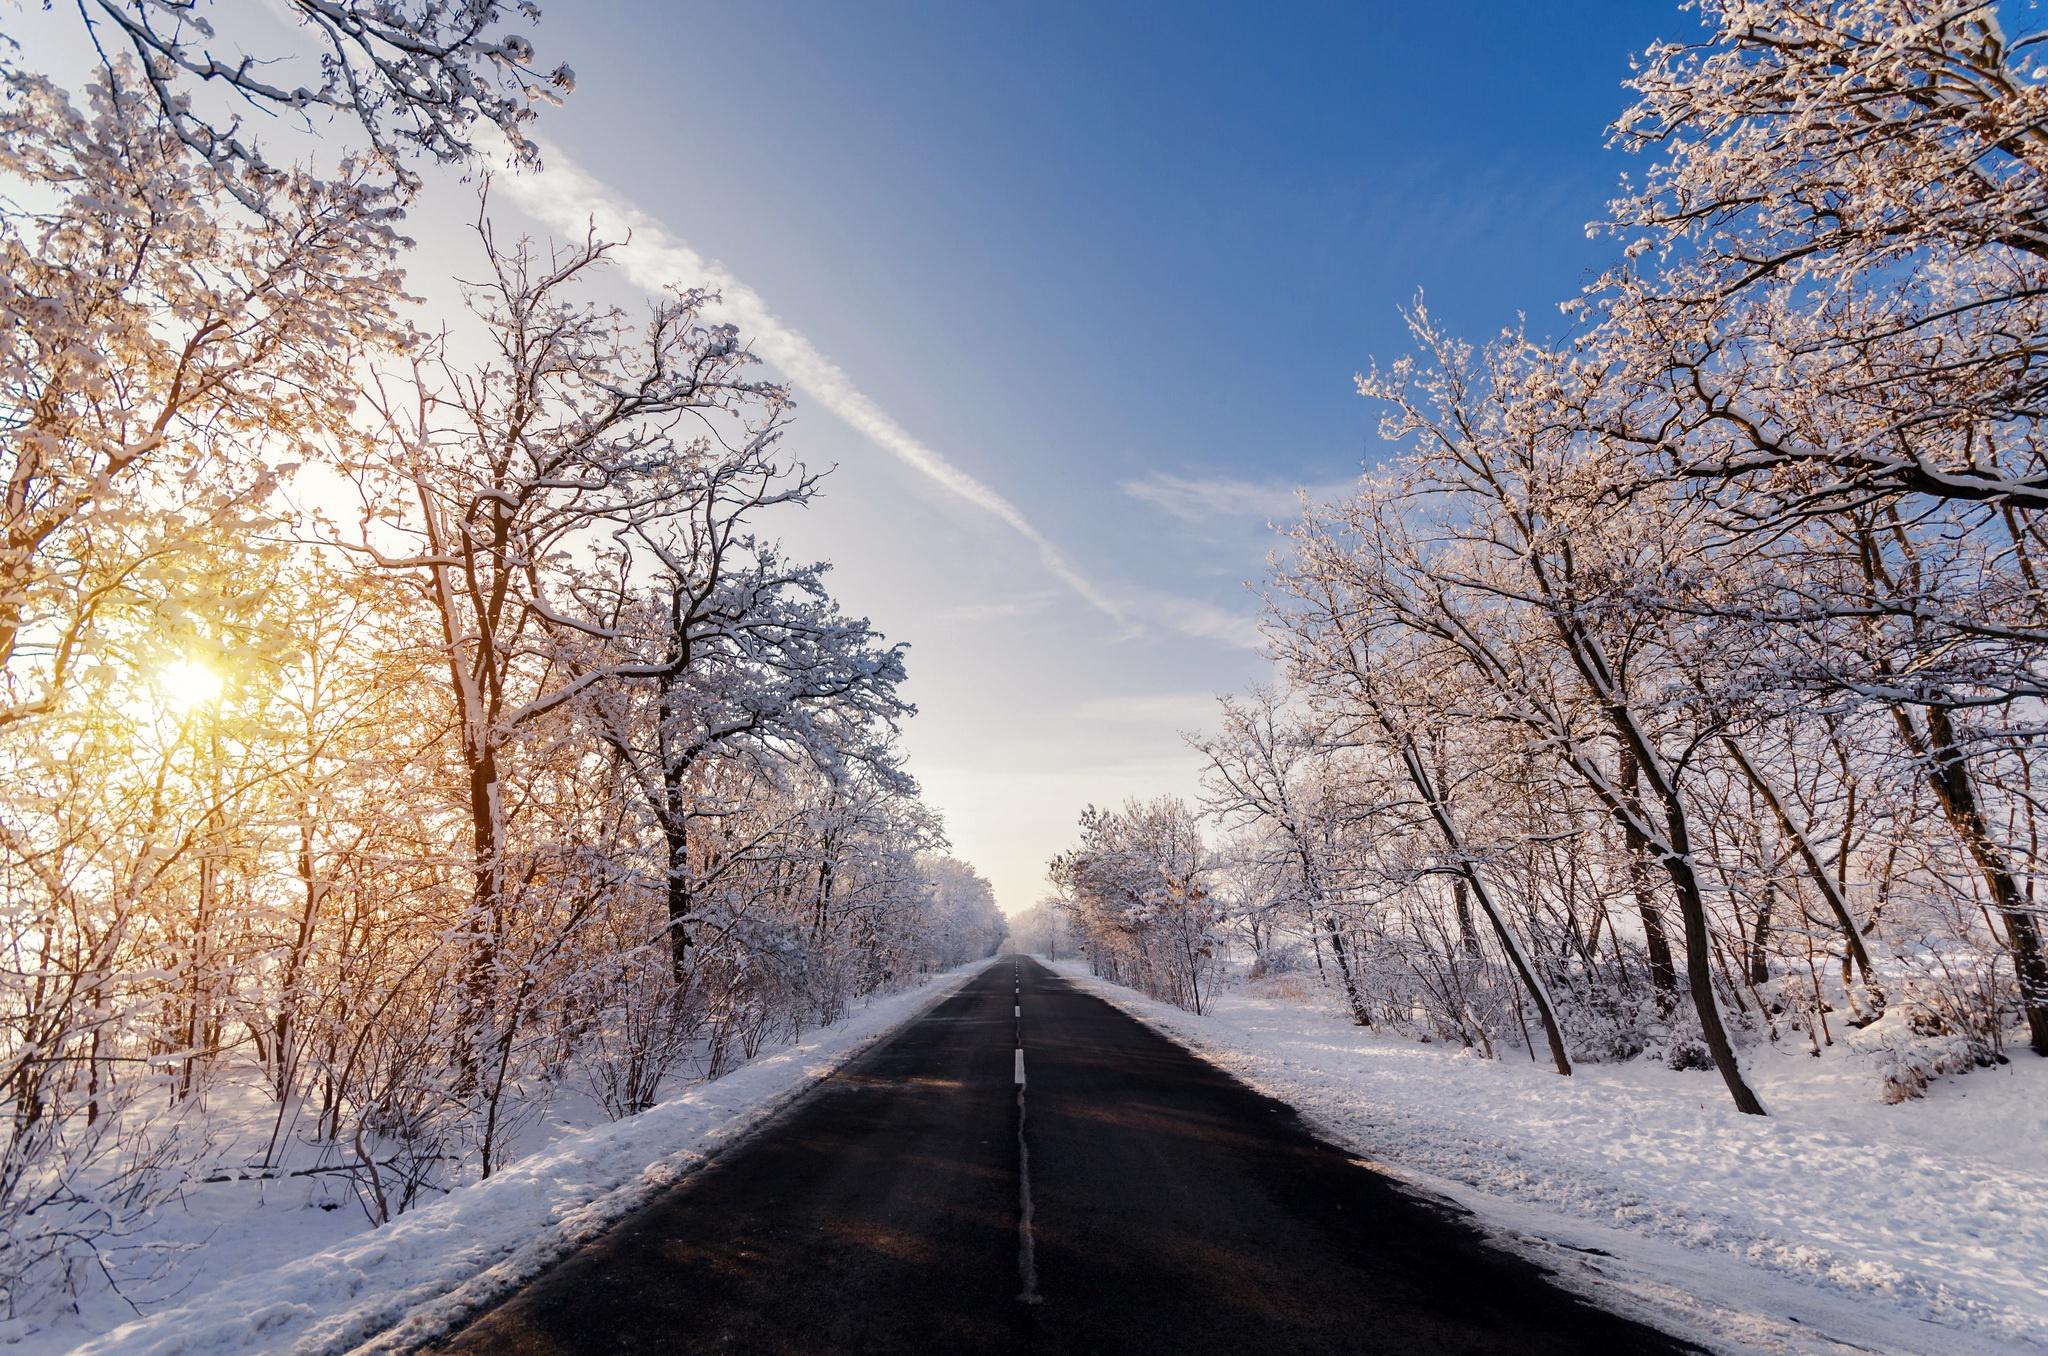 autumn winter road outdoors 1574939519 - Autumn Winter Road Outdoors -